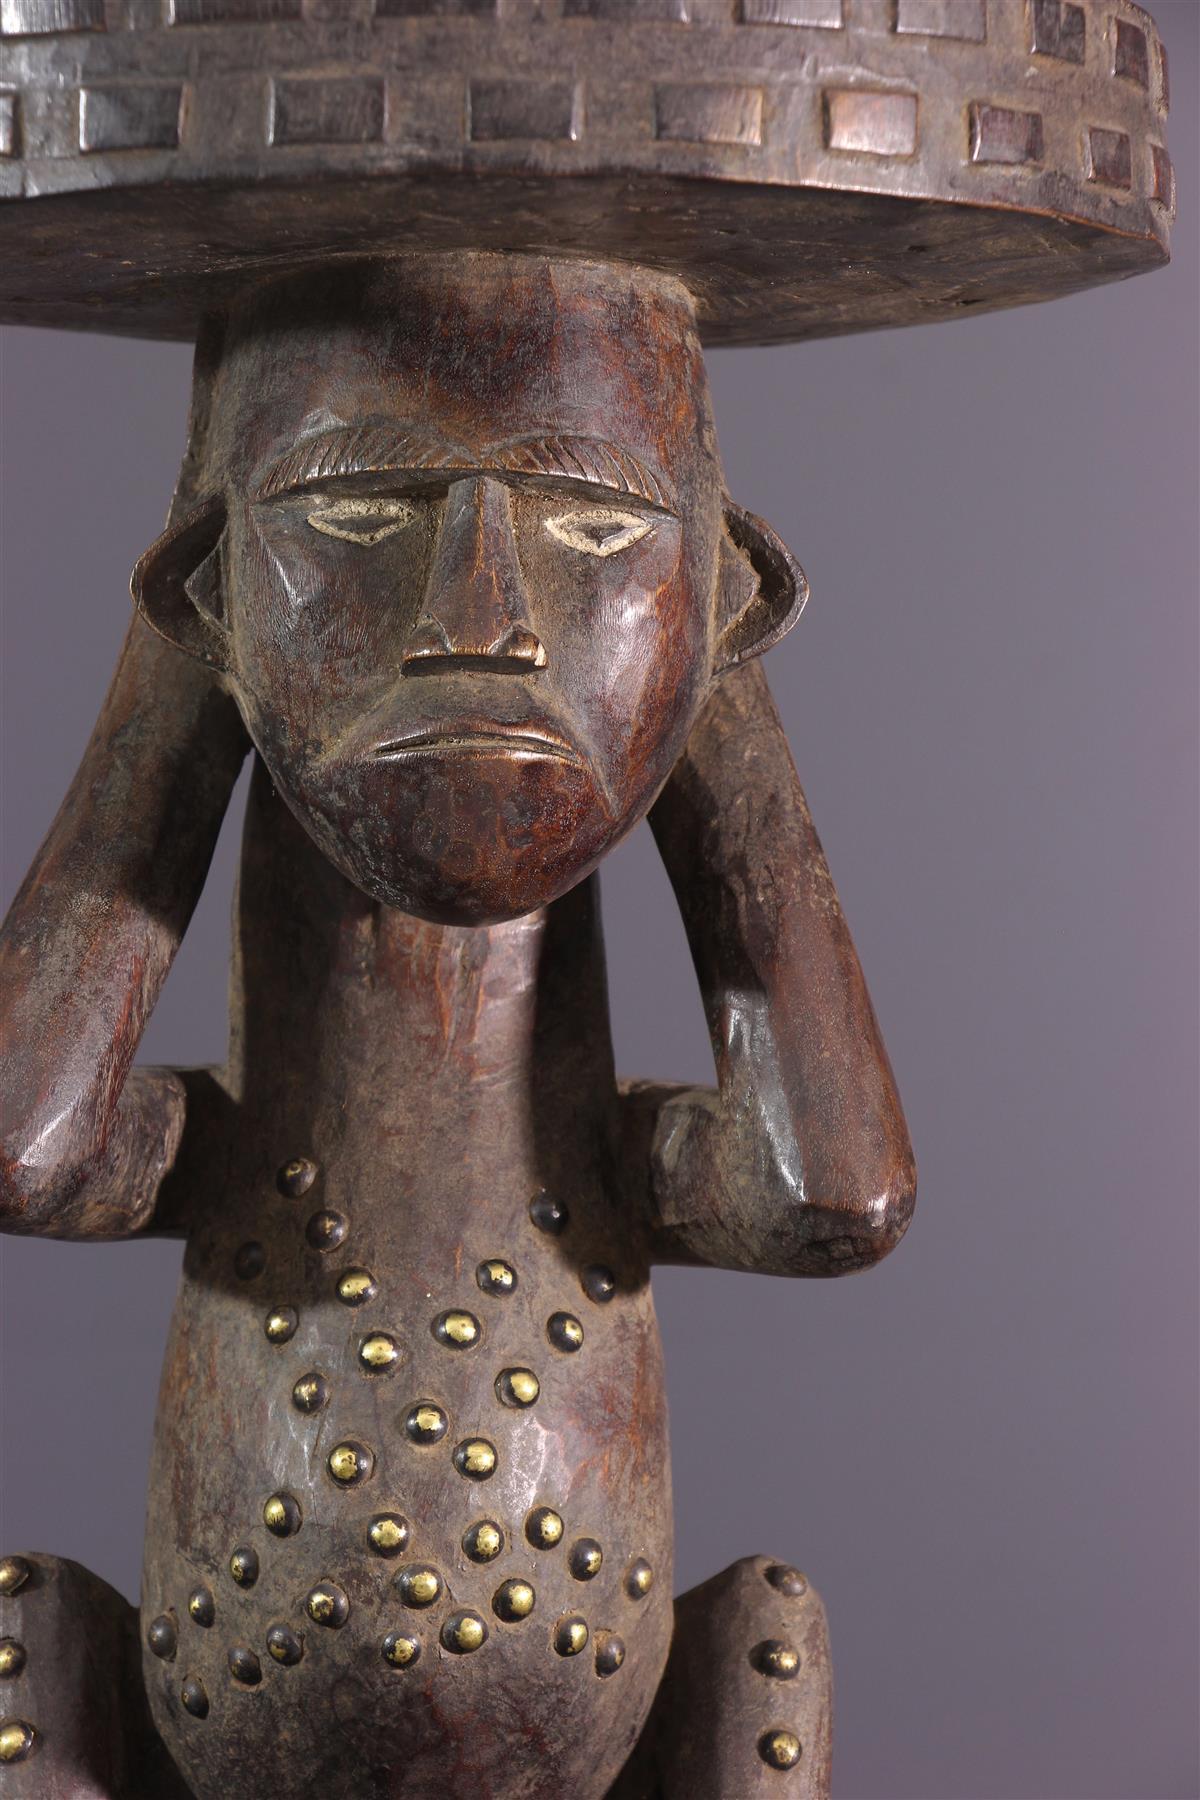 Zande stool - African art